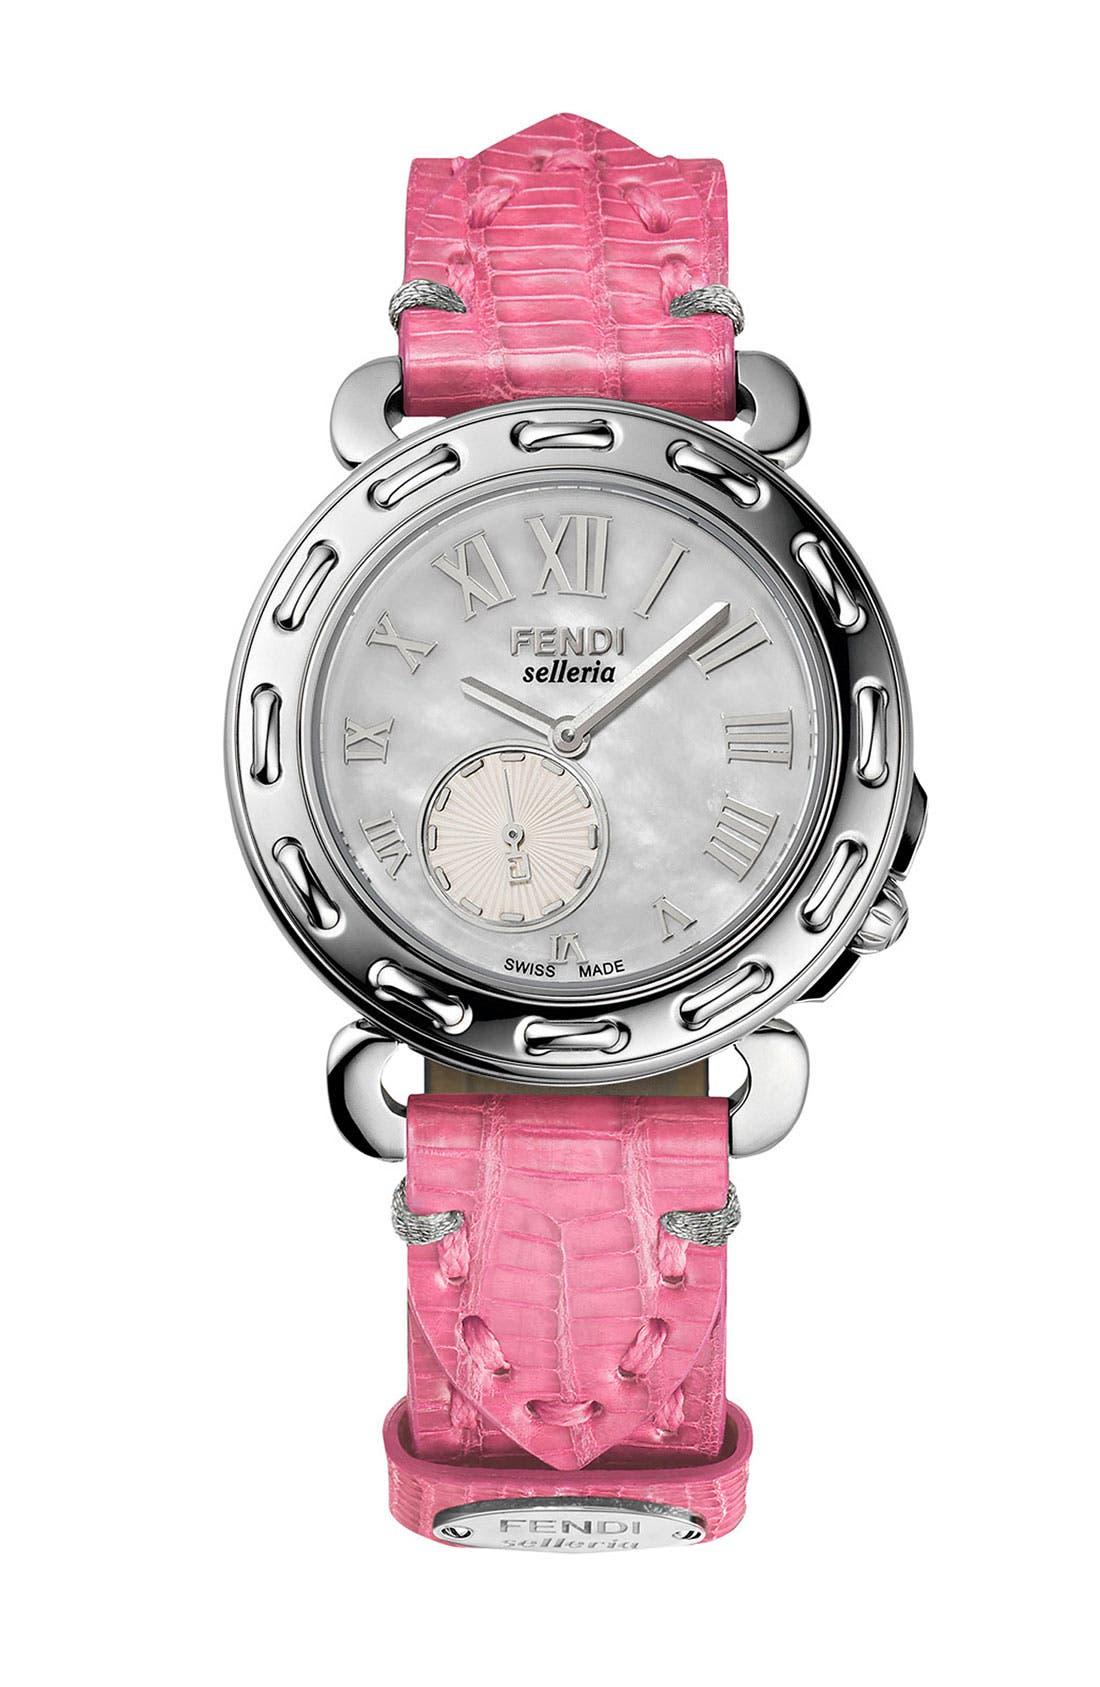 Alternate Image 1 Selected - Fendi 'Selleria' Customizable Watch